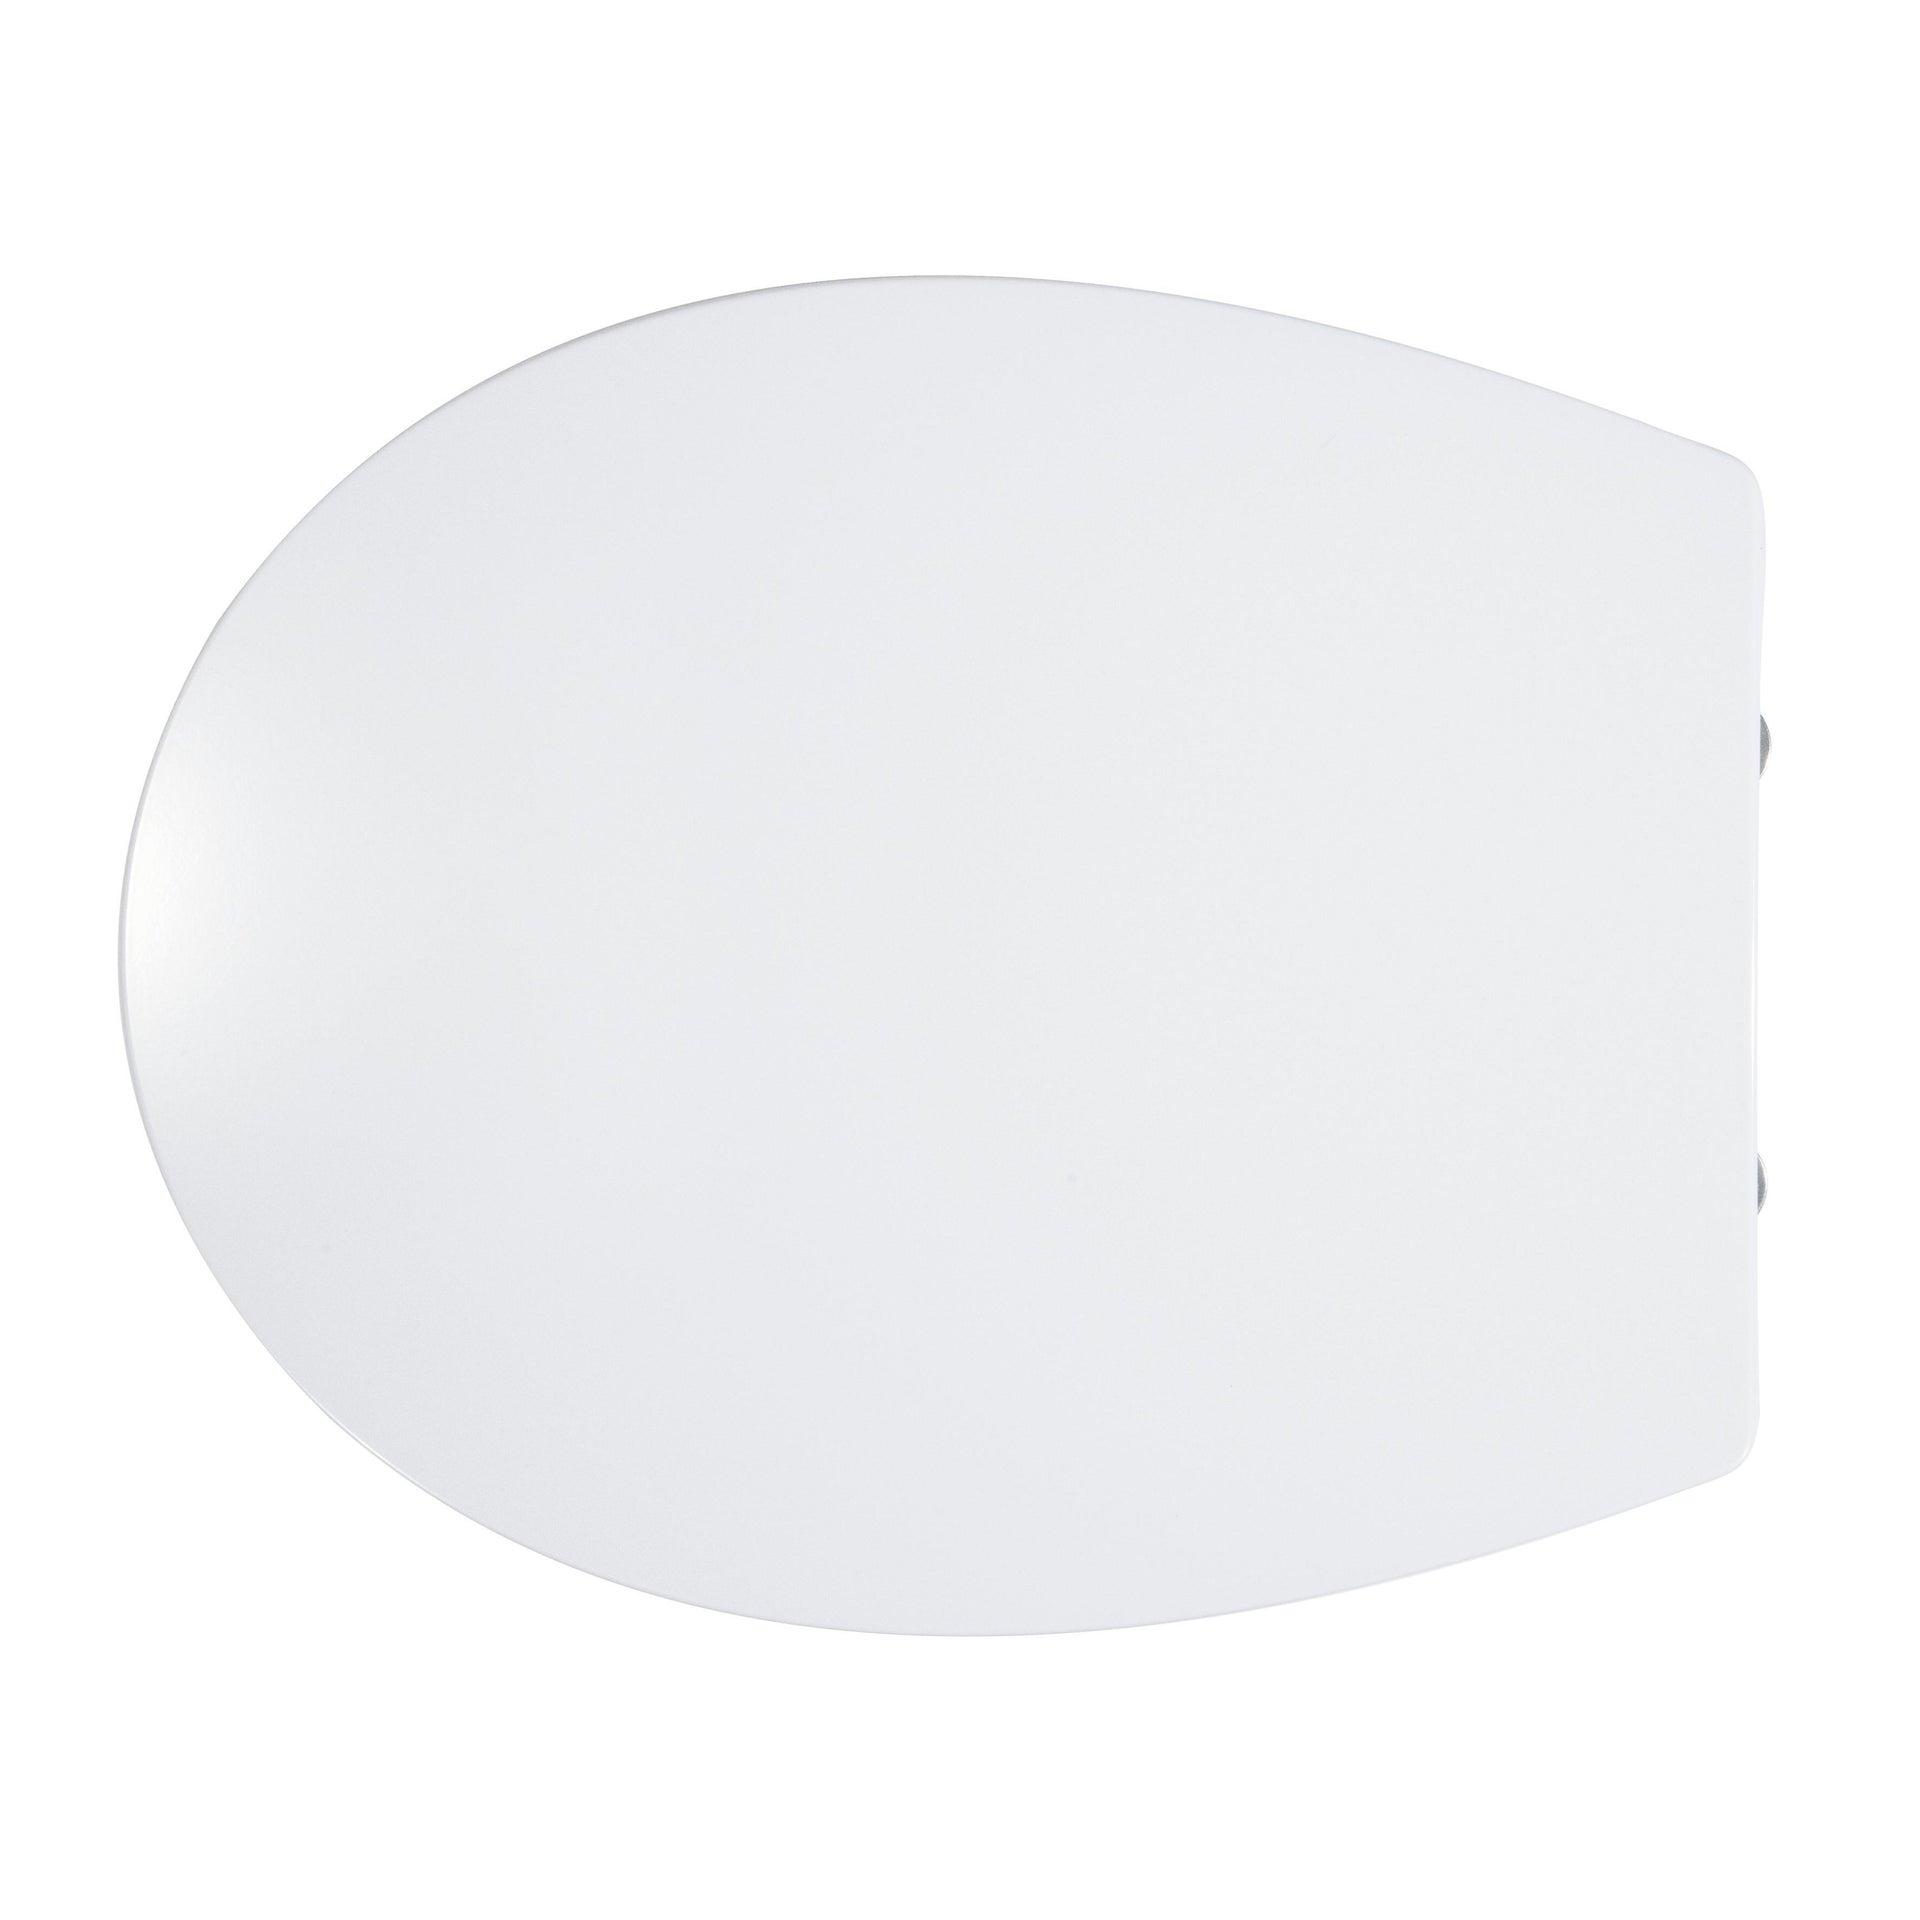 Copriwater ovale Originale per serie sanitari Miky New IDEAL STANDARD termoindurente bianco - 6